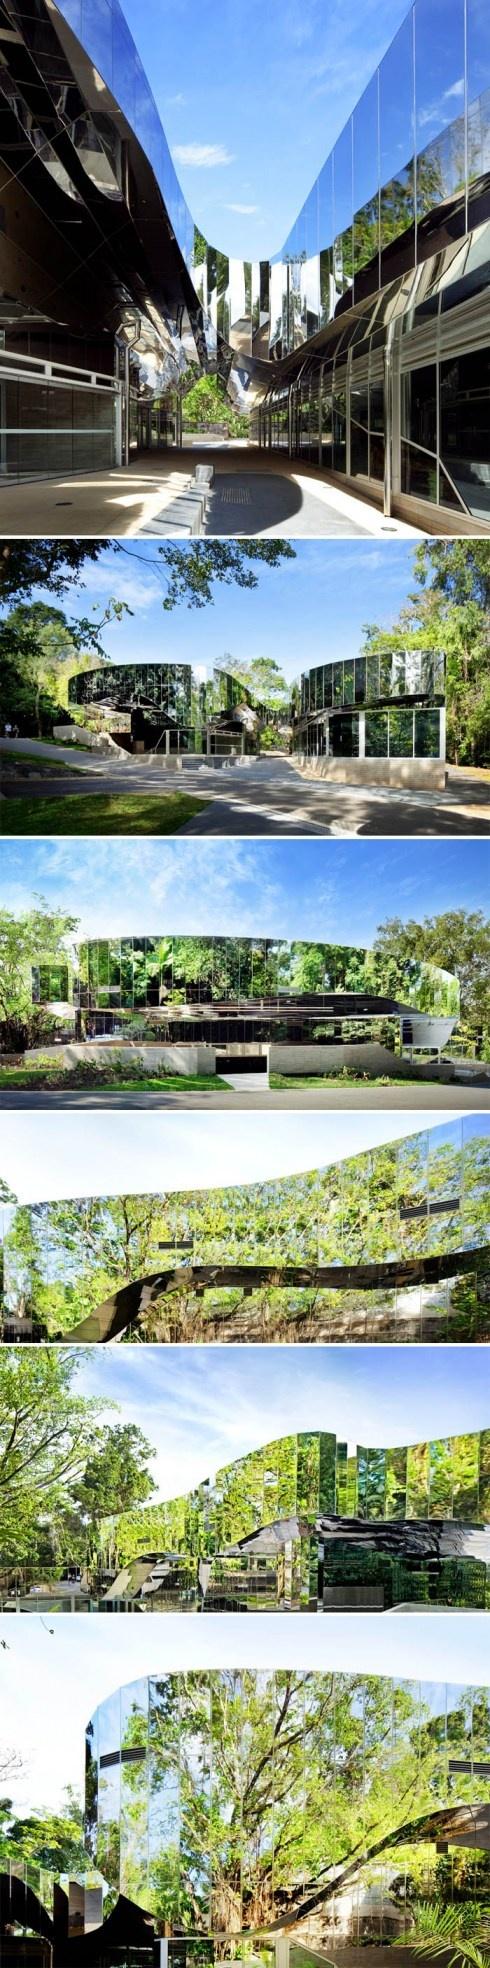 Cairns Botanic Gardens Visitors Centre